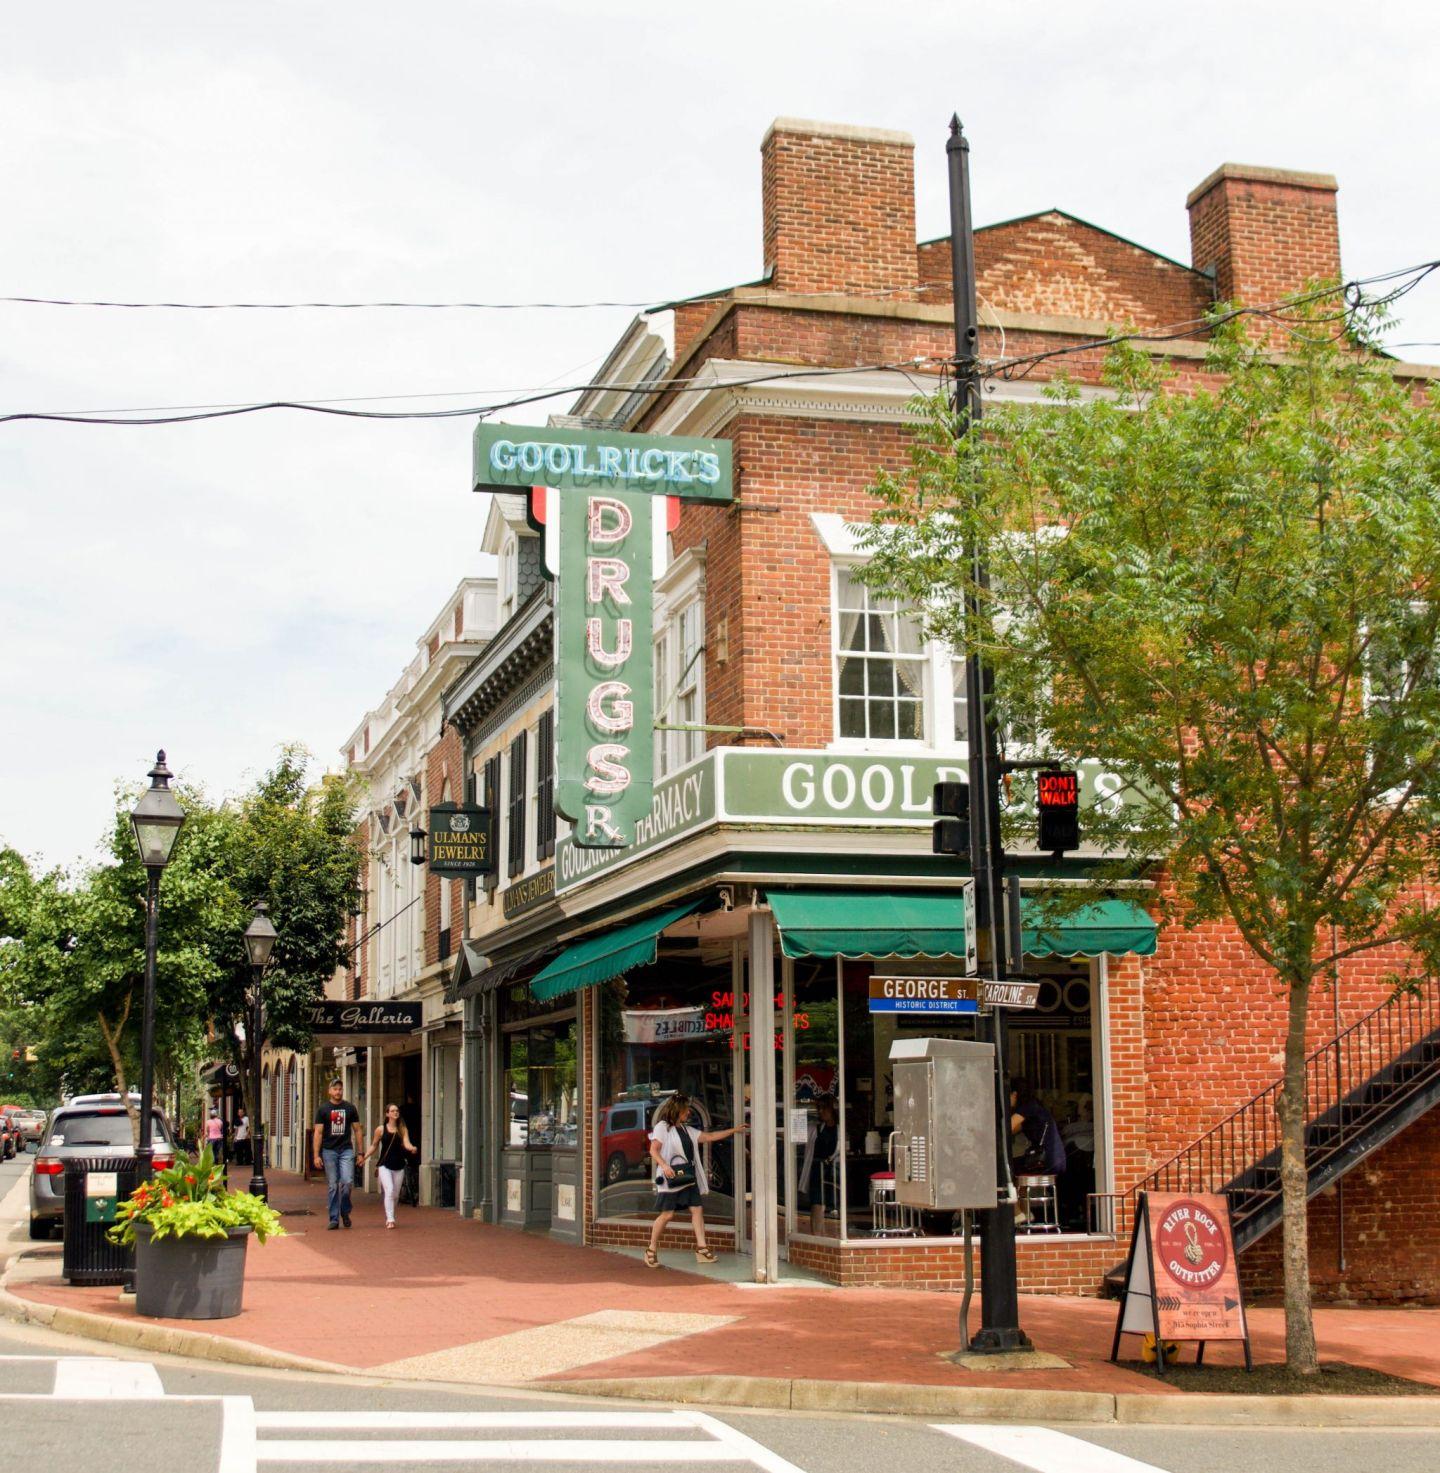 goolrick's pharmacy - goolrick's soda - visit fredericksburg - weekend in fredericksburg